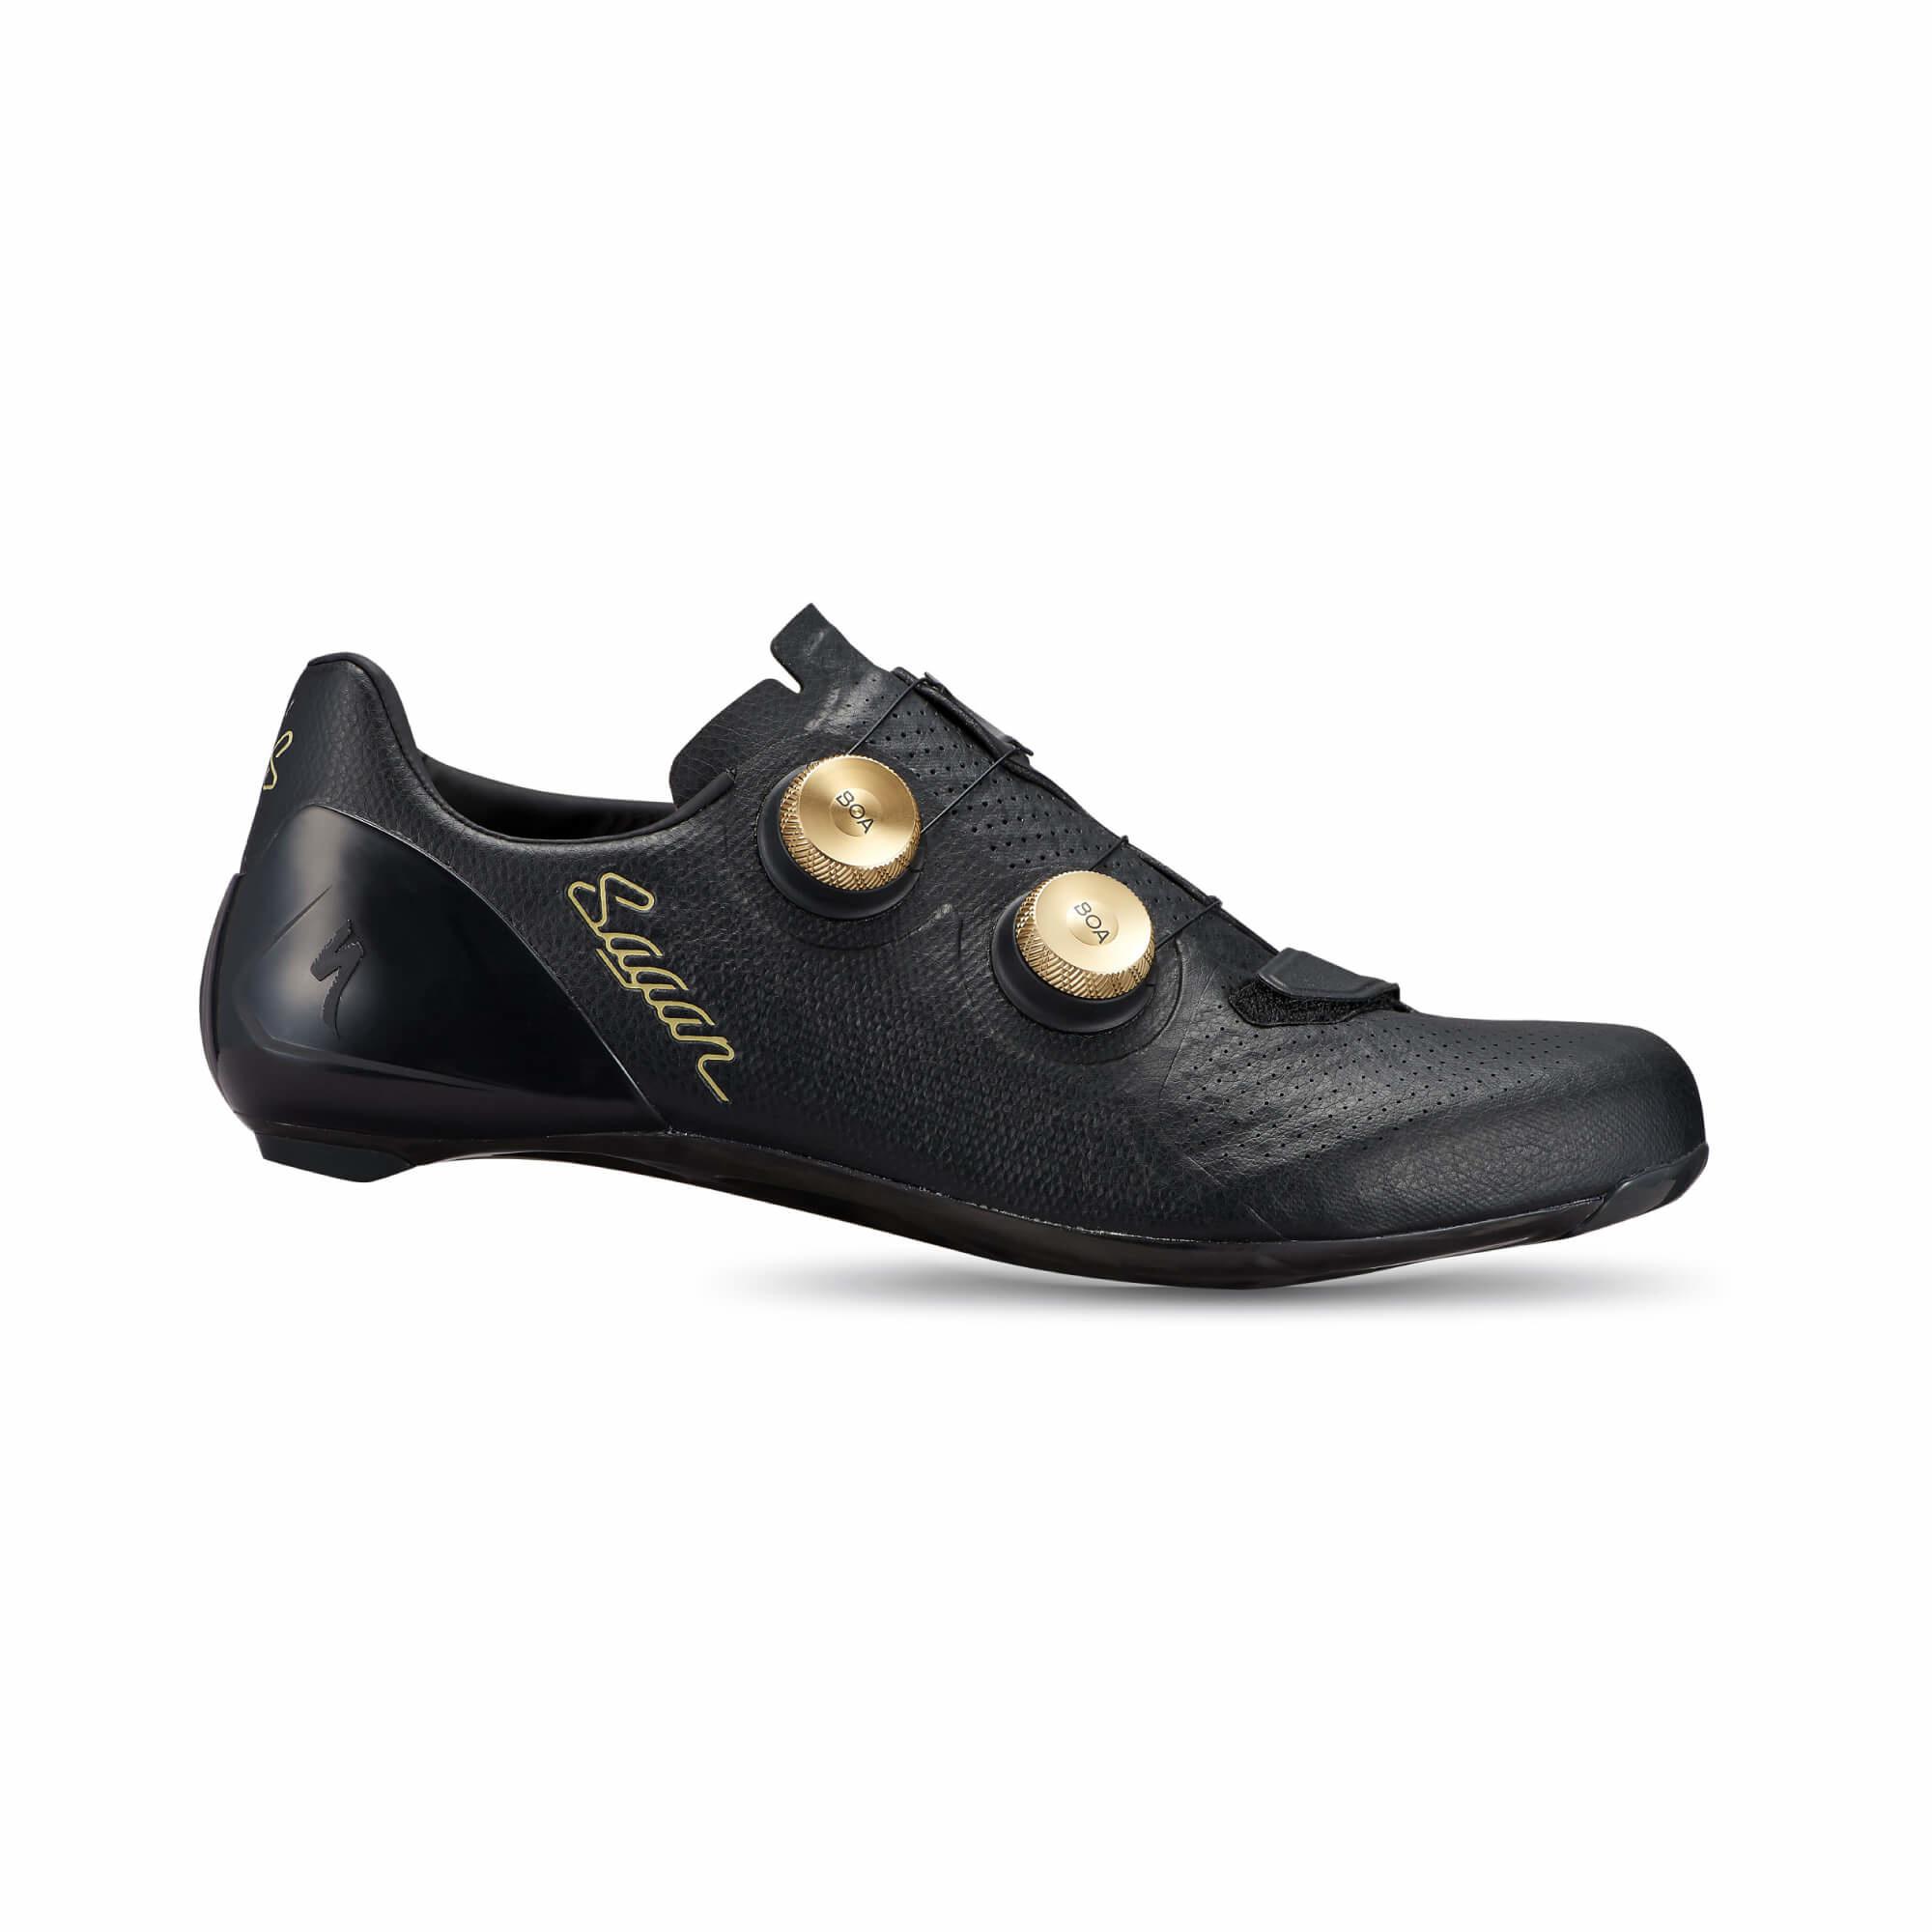 S-Works 7 Road Shoe Sagan Disruption LTD 2022-1